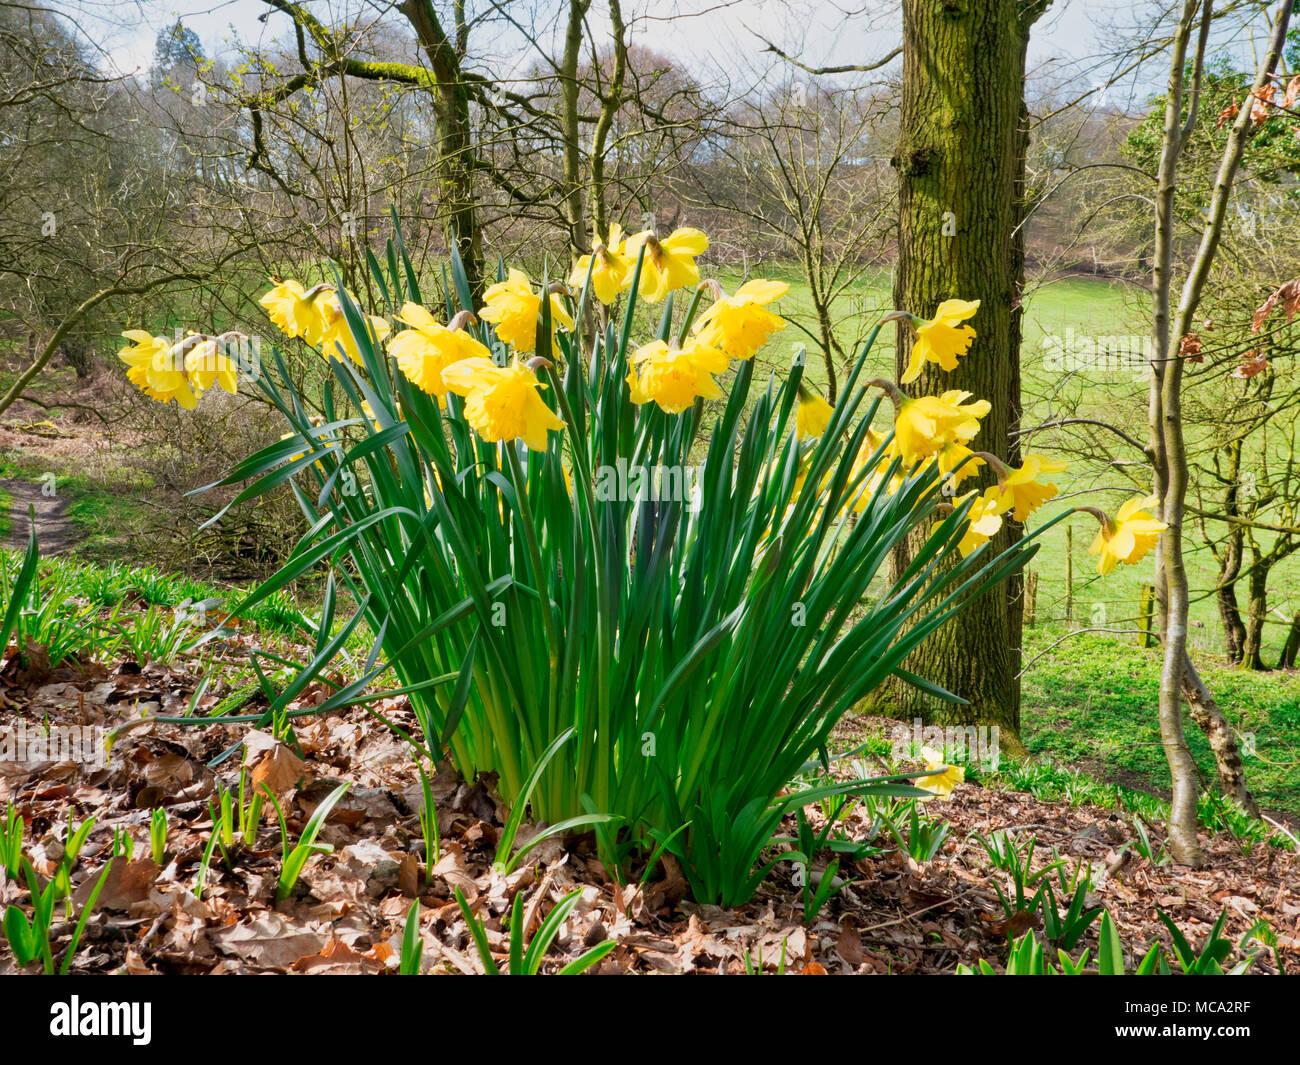 Derbyshire, UK, 14 April 2018. Blooming daffodils as warm spring temperatures finally arrive in Ashbourne, Derbyshire, Peak District National Park Credit: Doug Blane/Alamy Live News - Stock Image